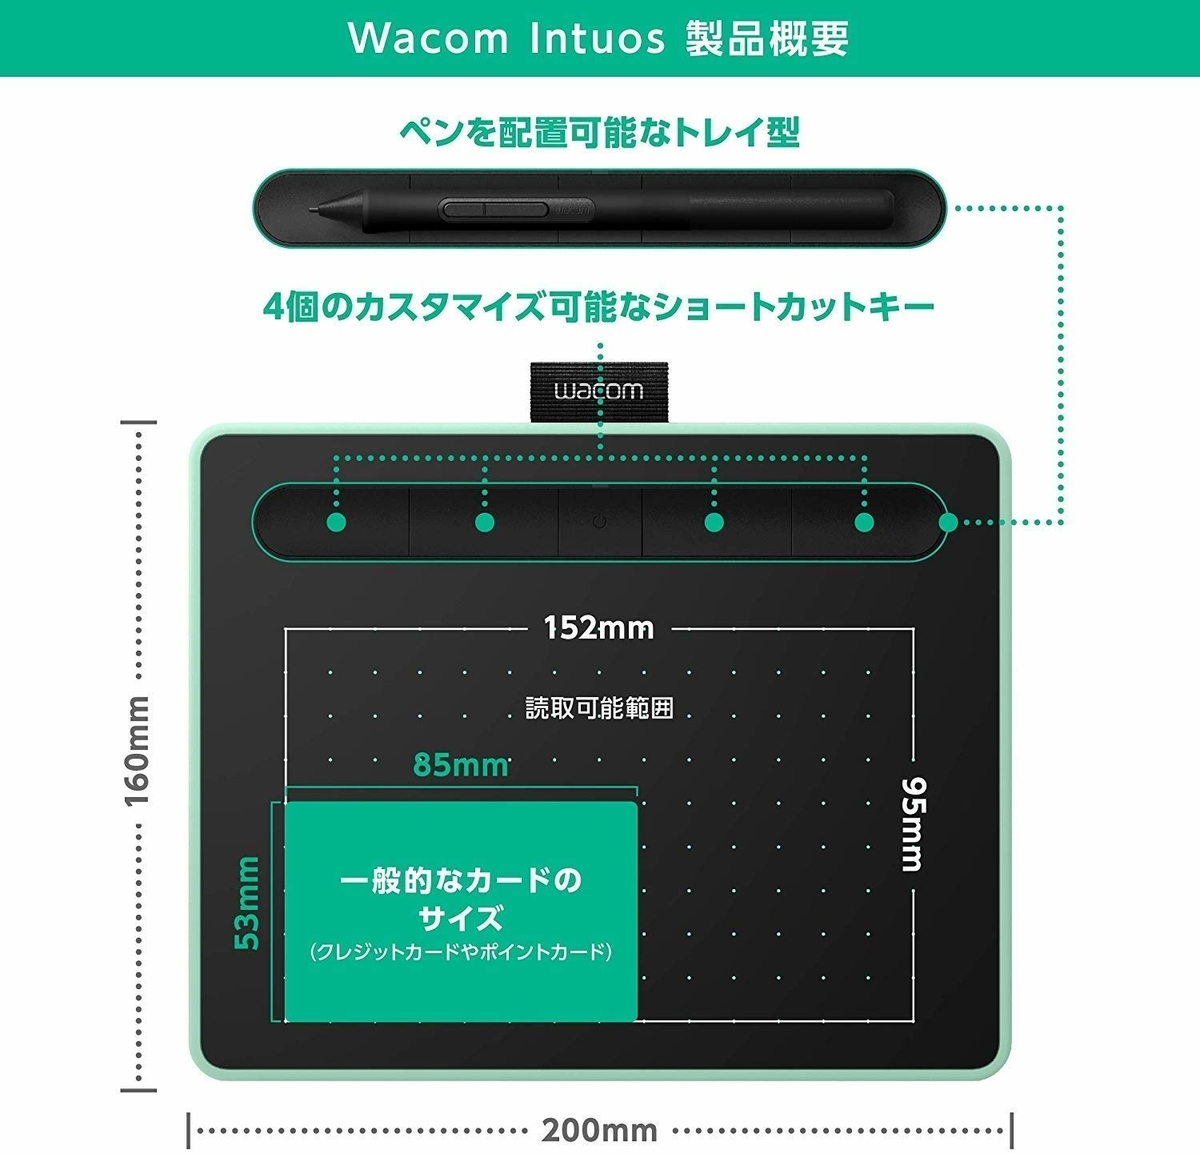 wacom ペンタブレット Amazon限定